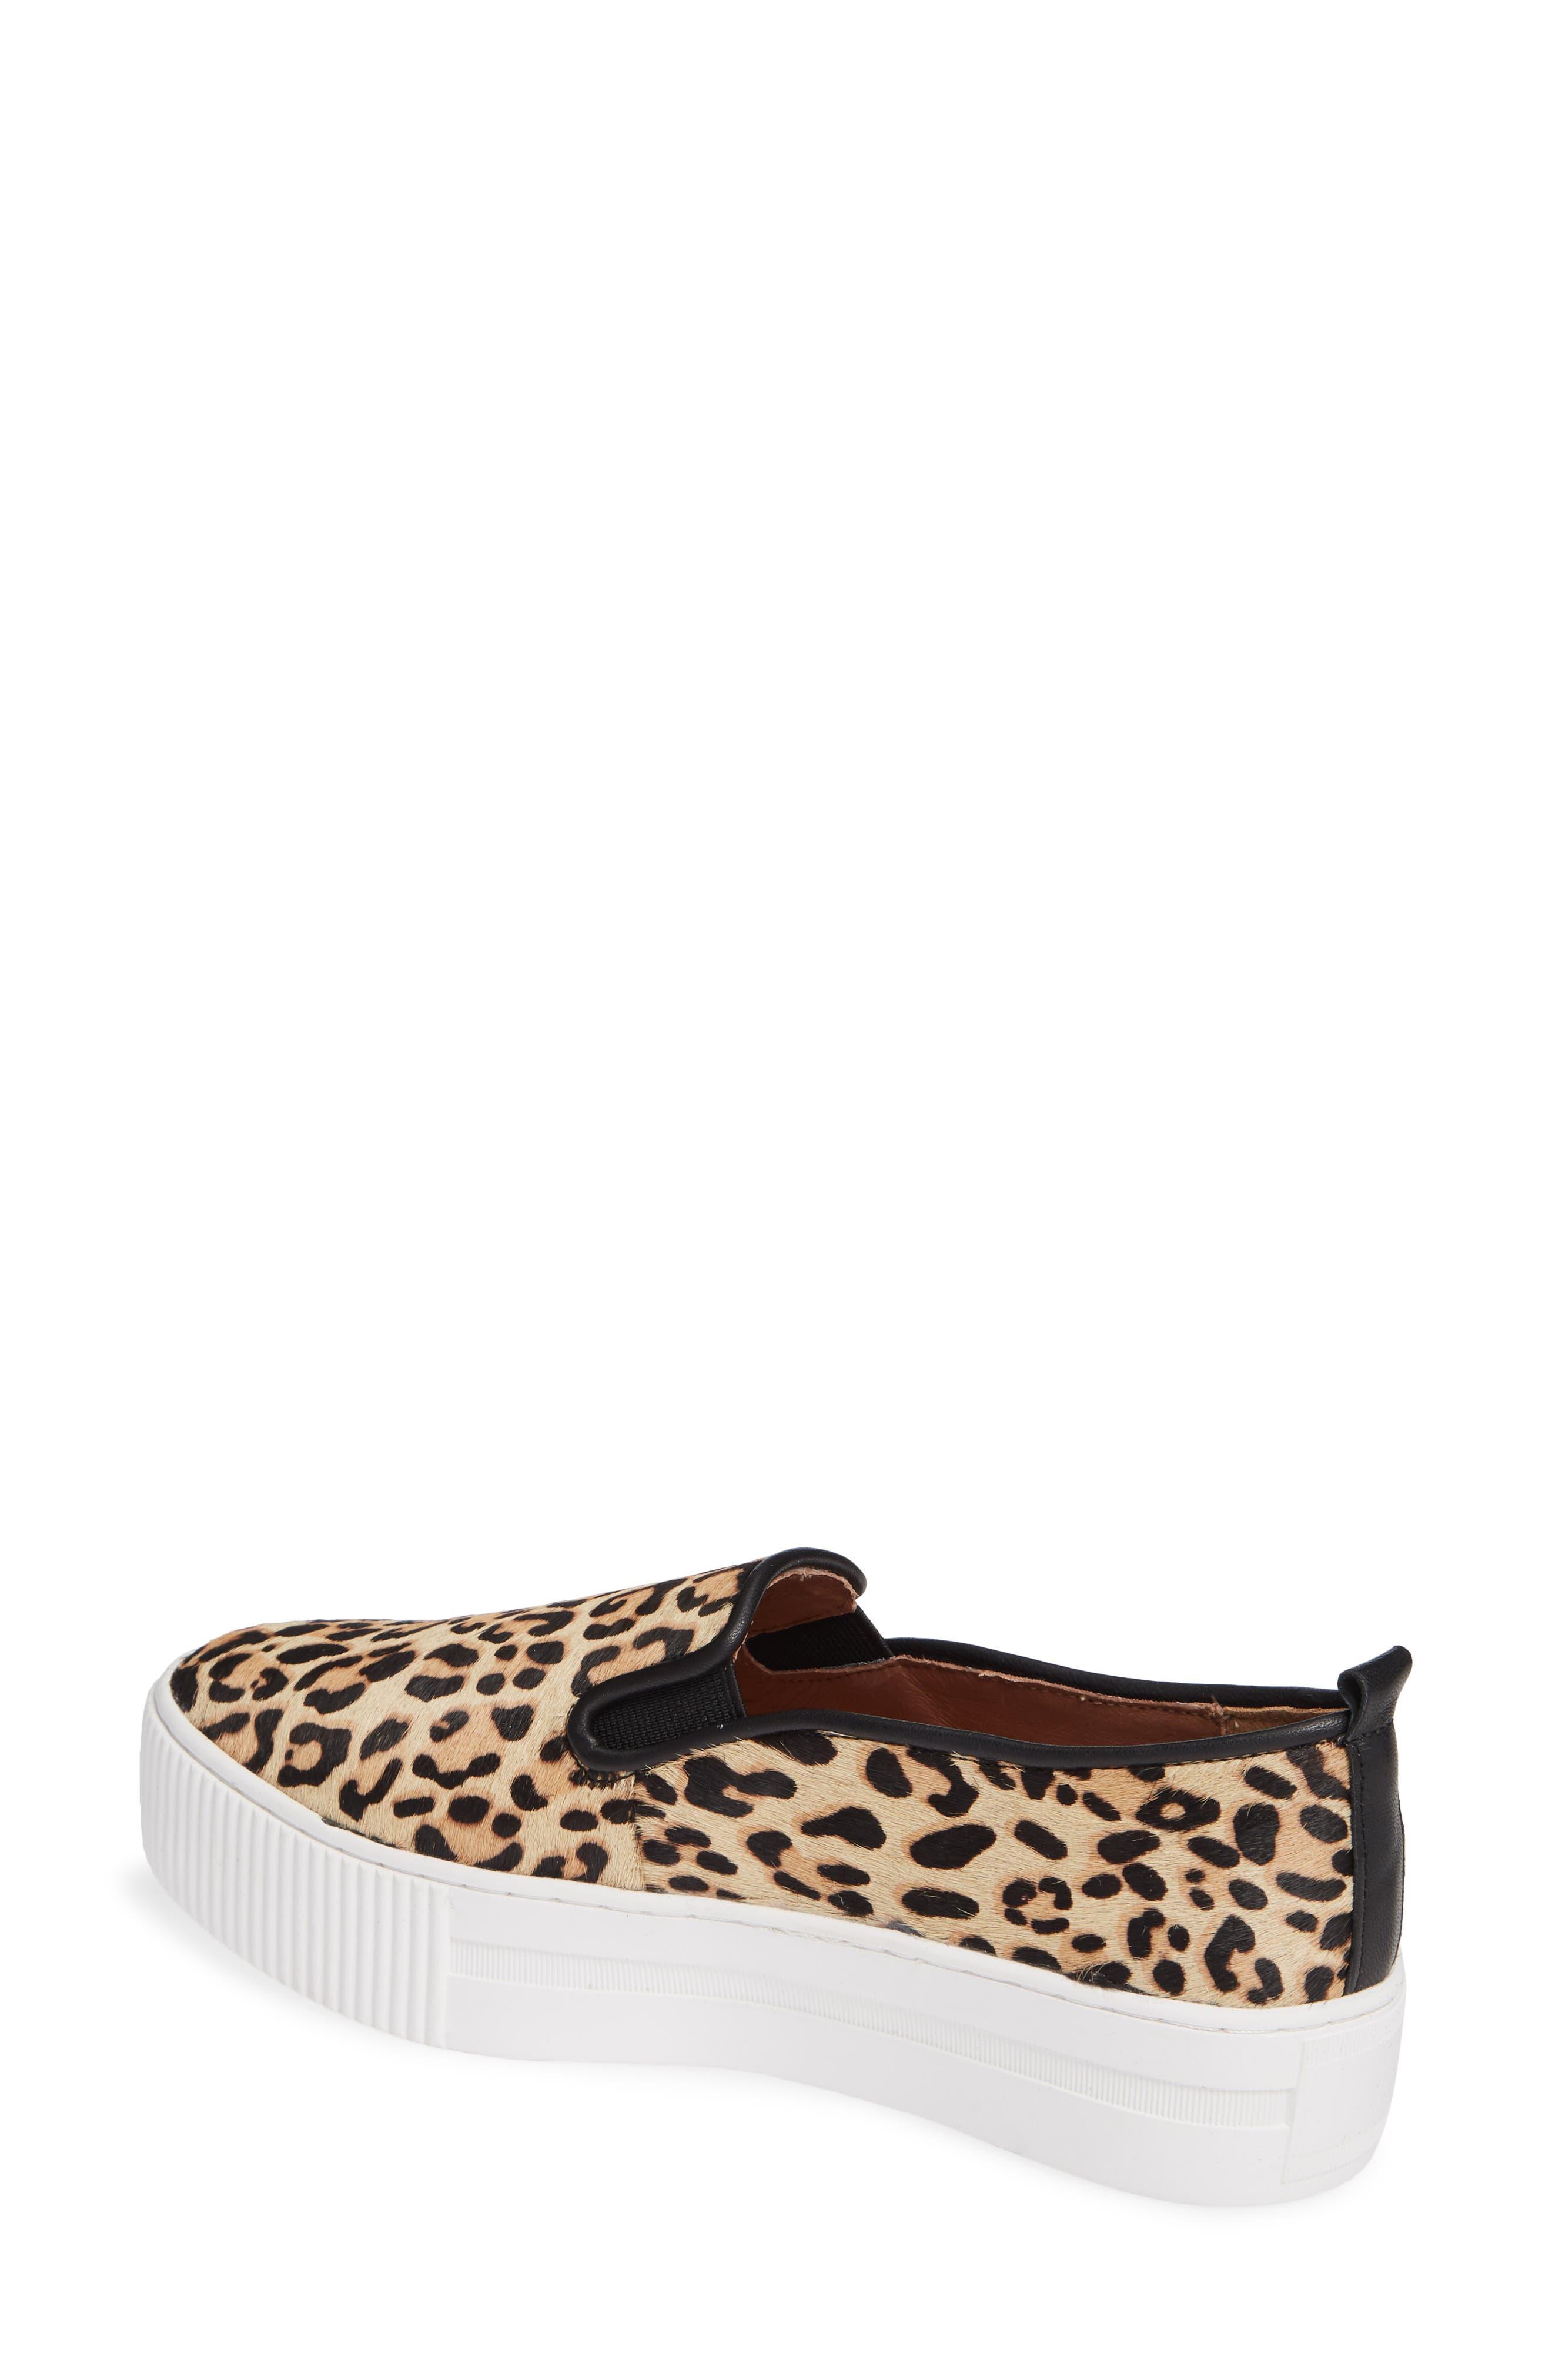 Baylee Platform Slip-On Sneaker,                             Alternate thumbnail 2, color,                             LEOPARD HAIRCALF